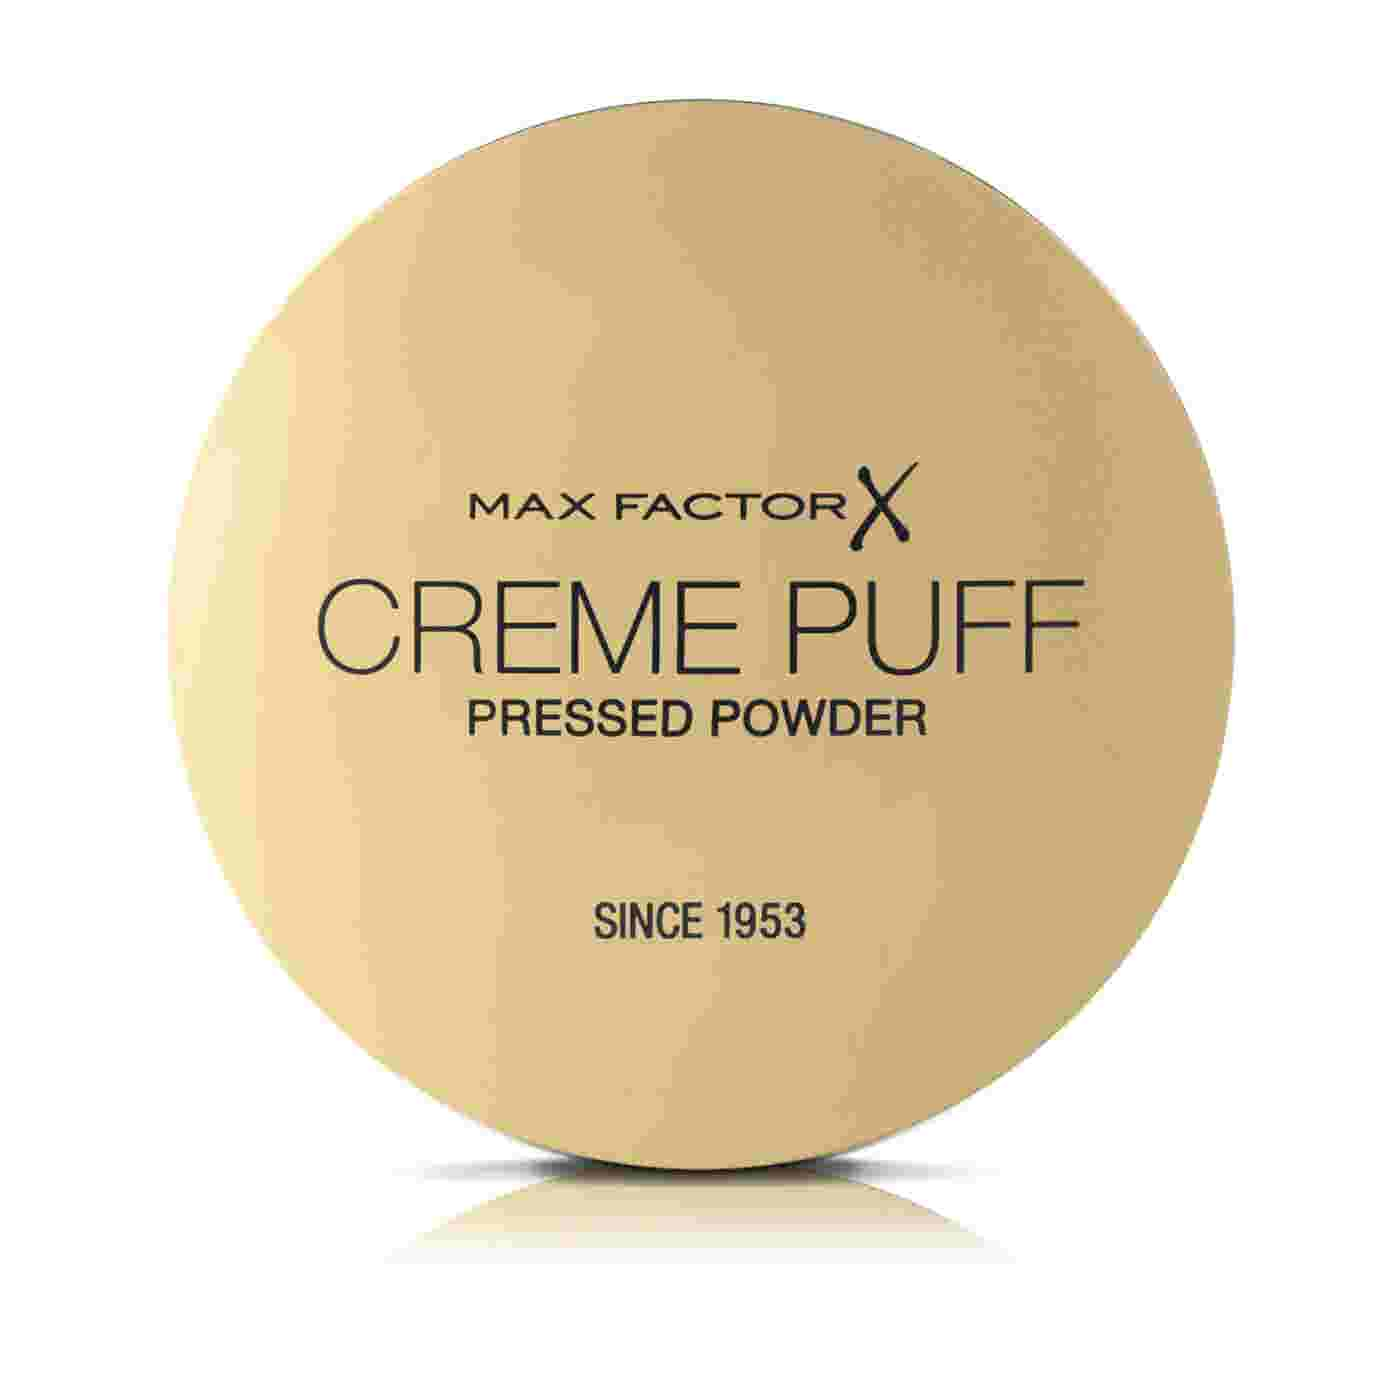 Max Factor Crème Puff Pressed Powder